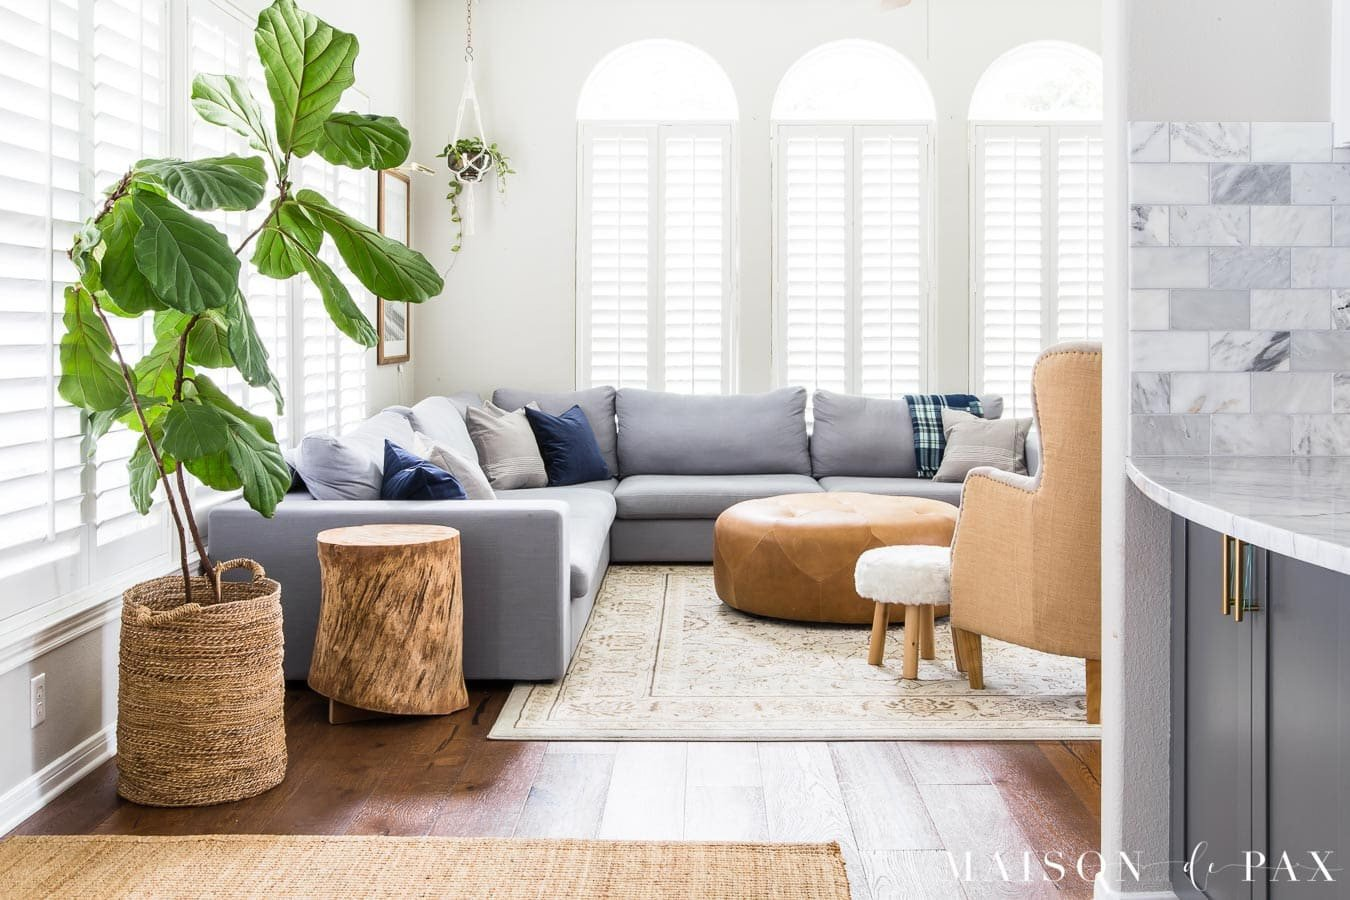 Simple Living Room Decorating Ideas Unique Gray Living Room with Simple Fall Decor Maison De Pax